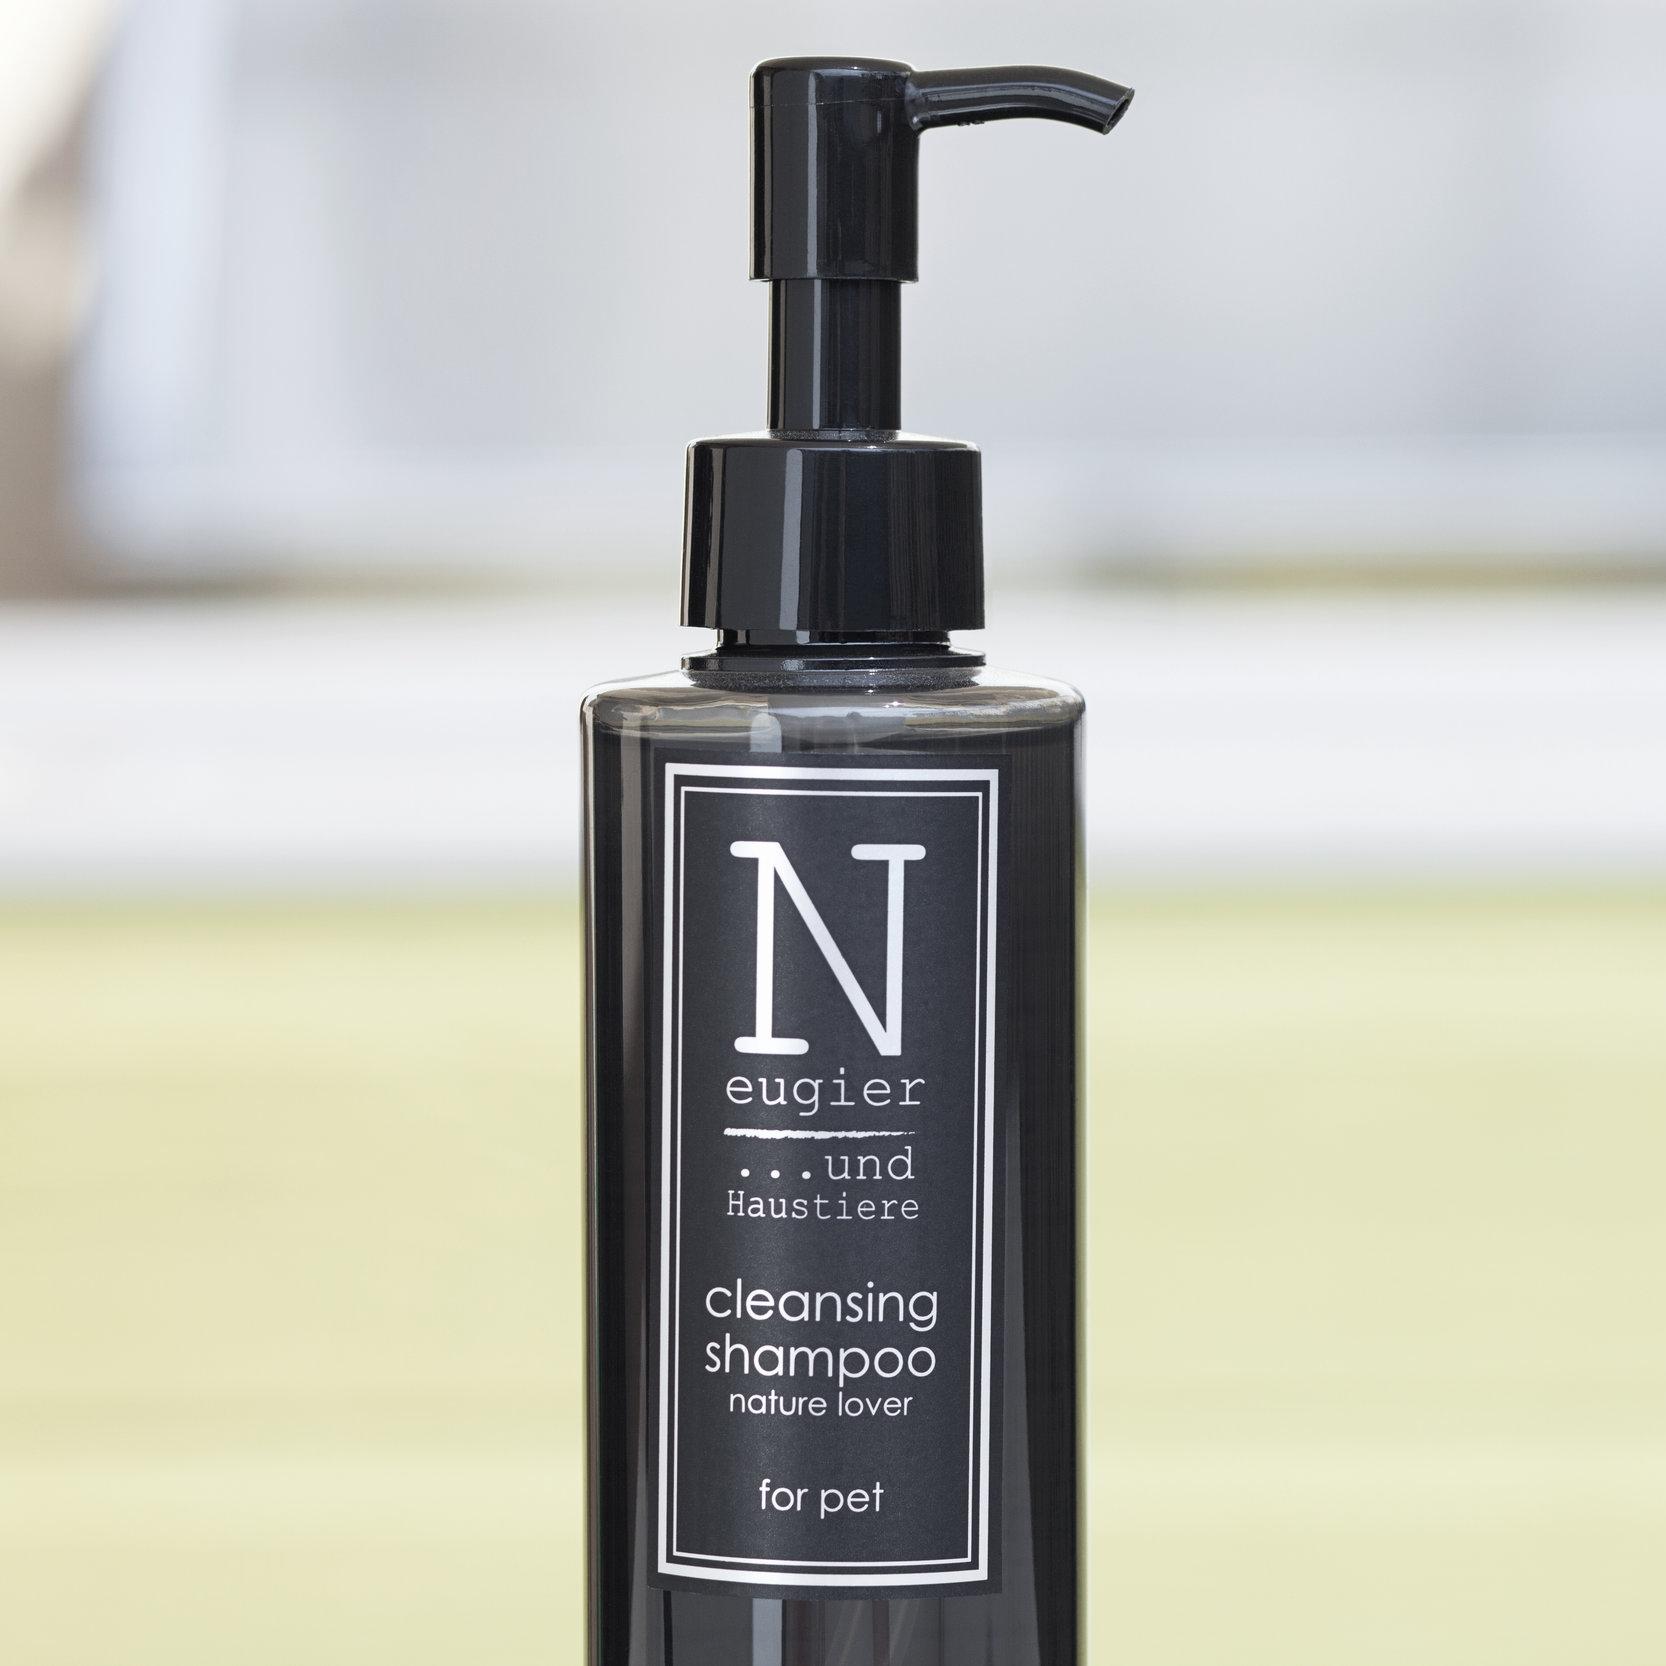 Neugier Cleansing Shampoo